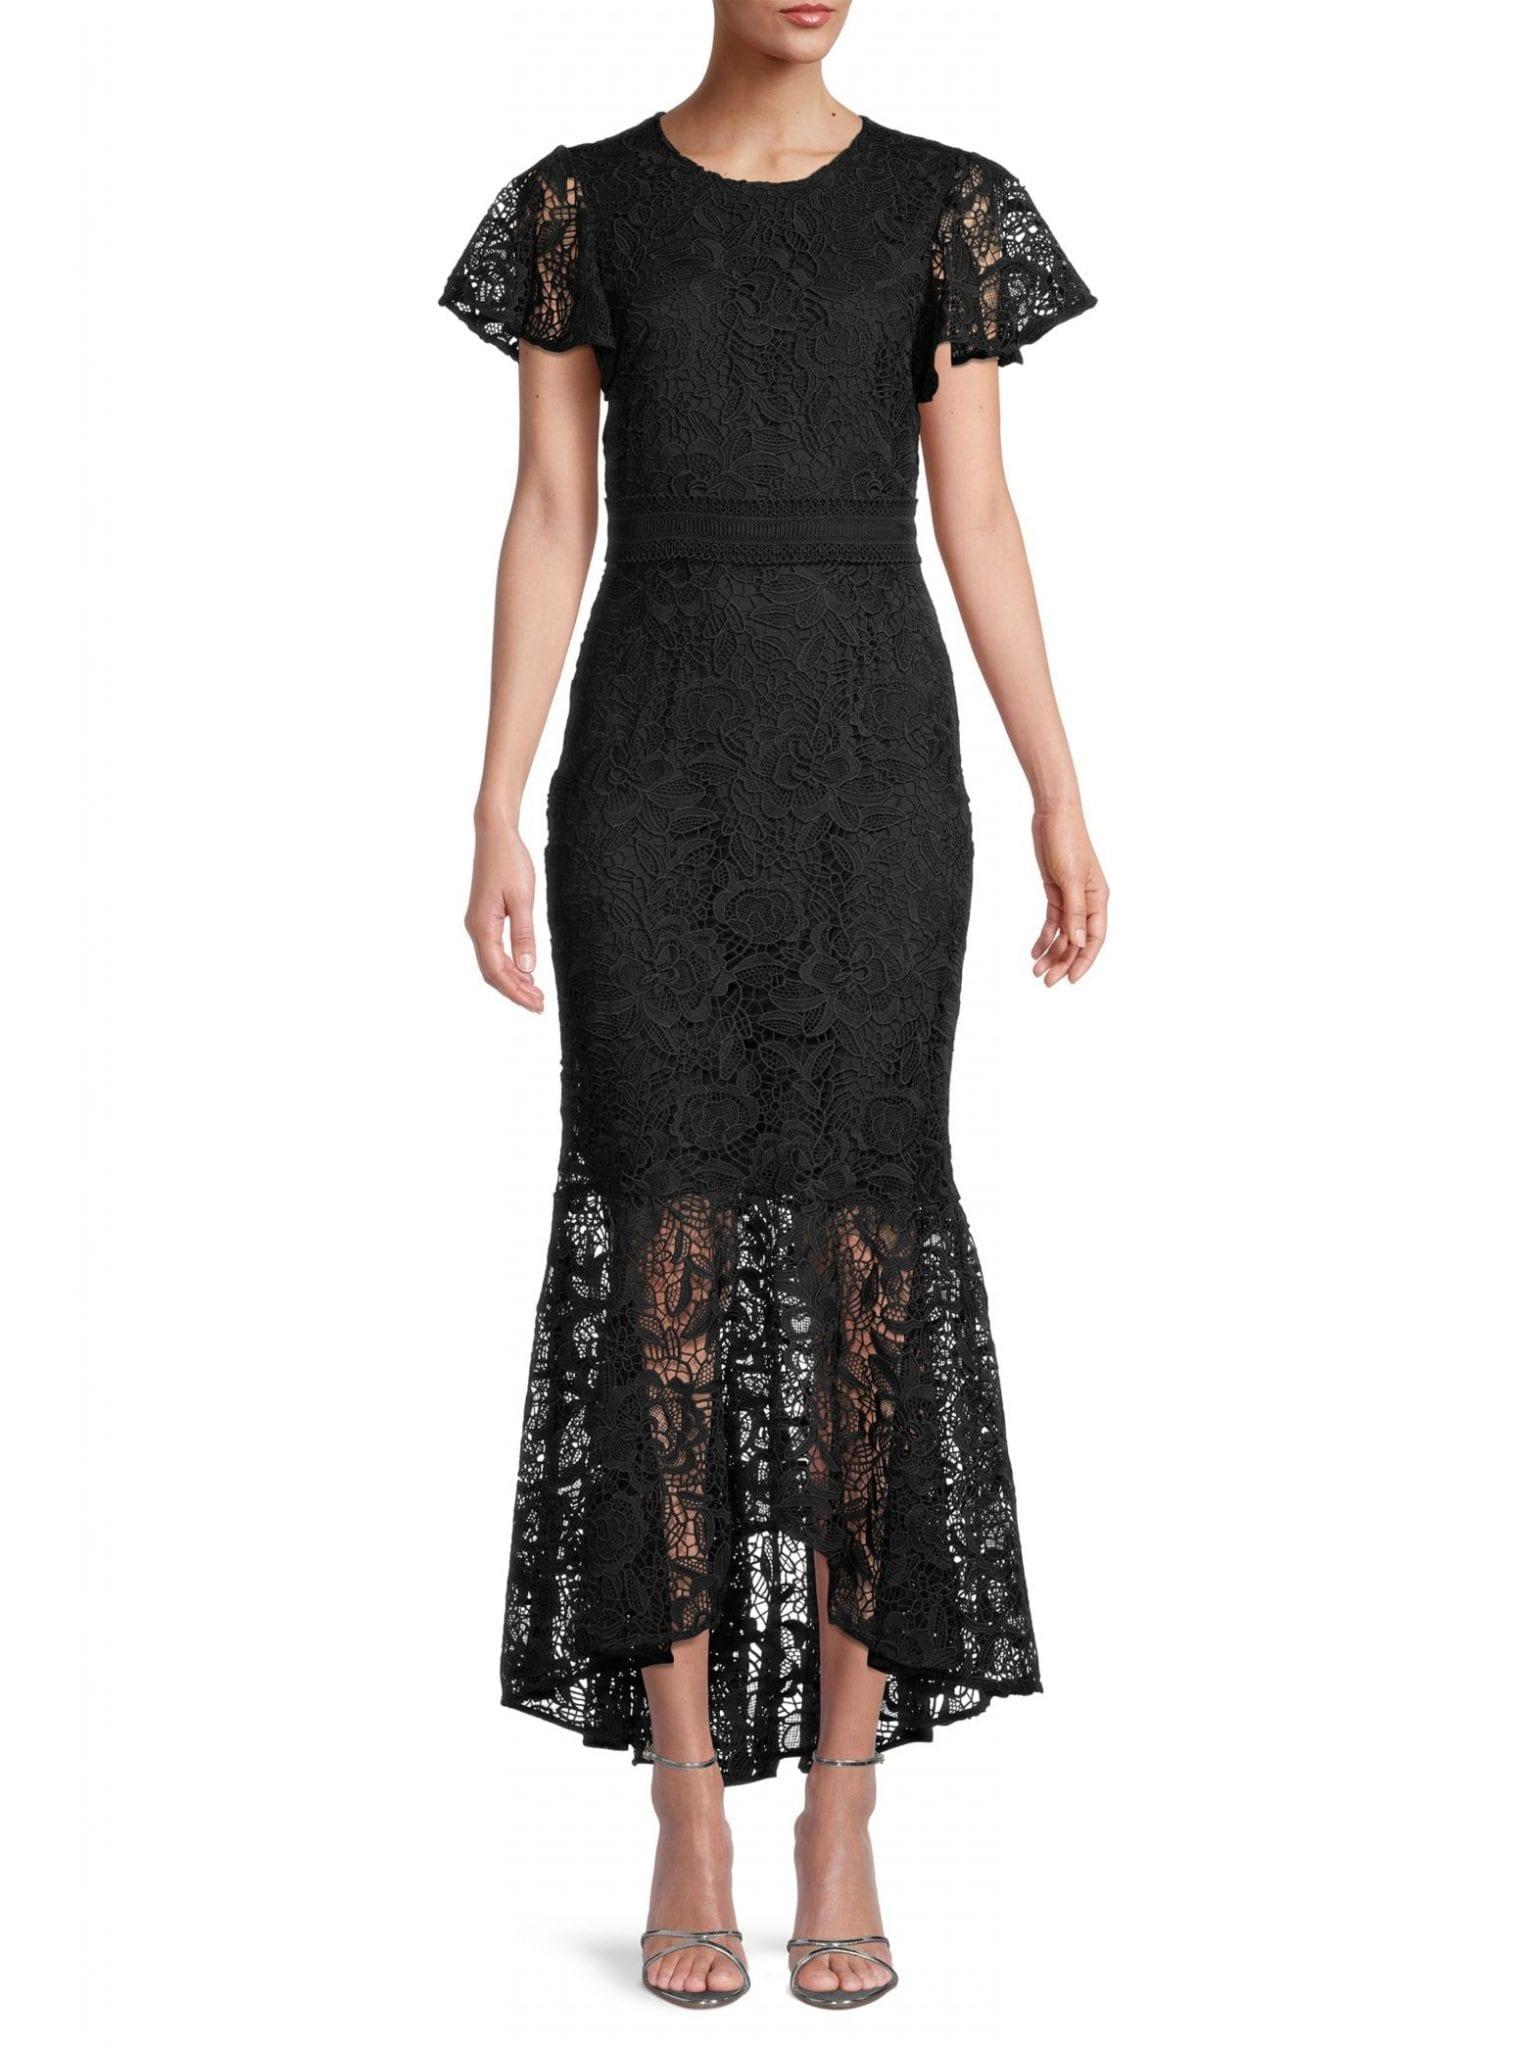 SHOSHANNA Wilton Lace High-Low Dress